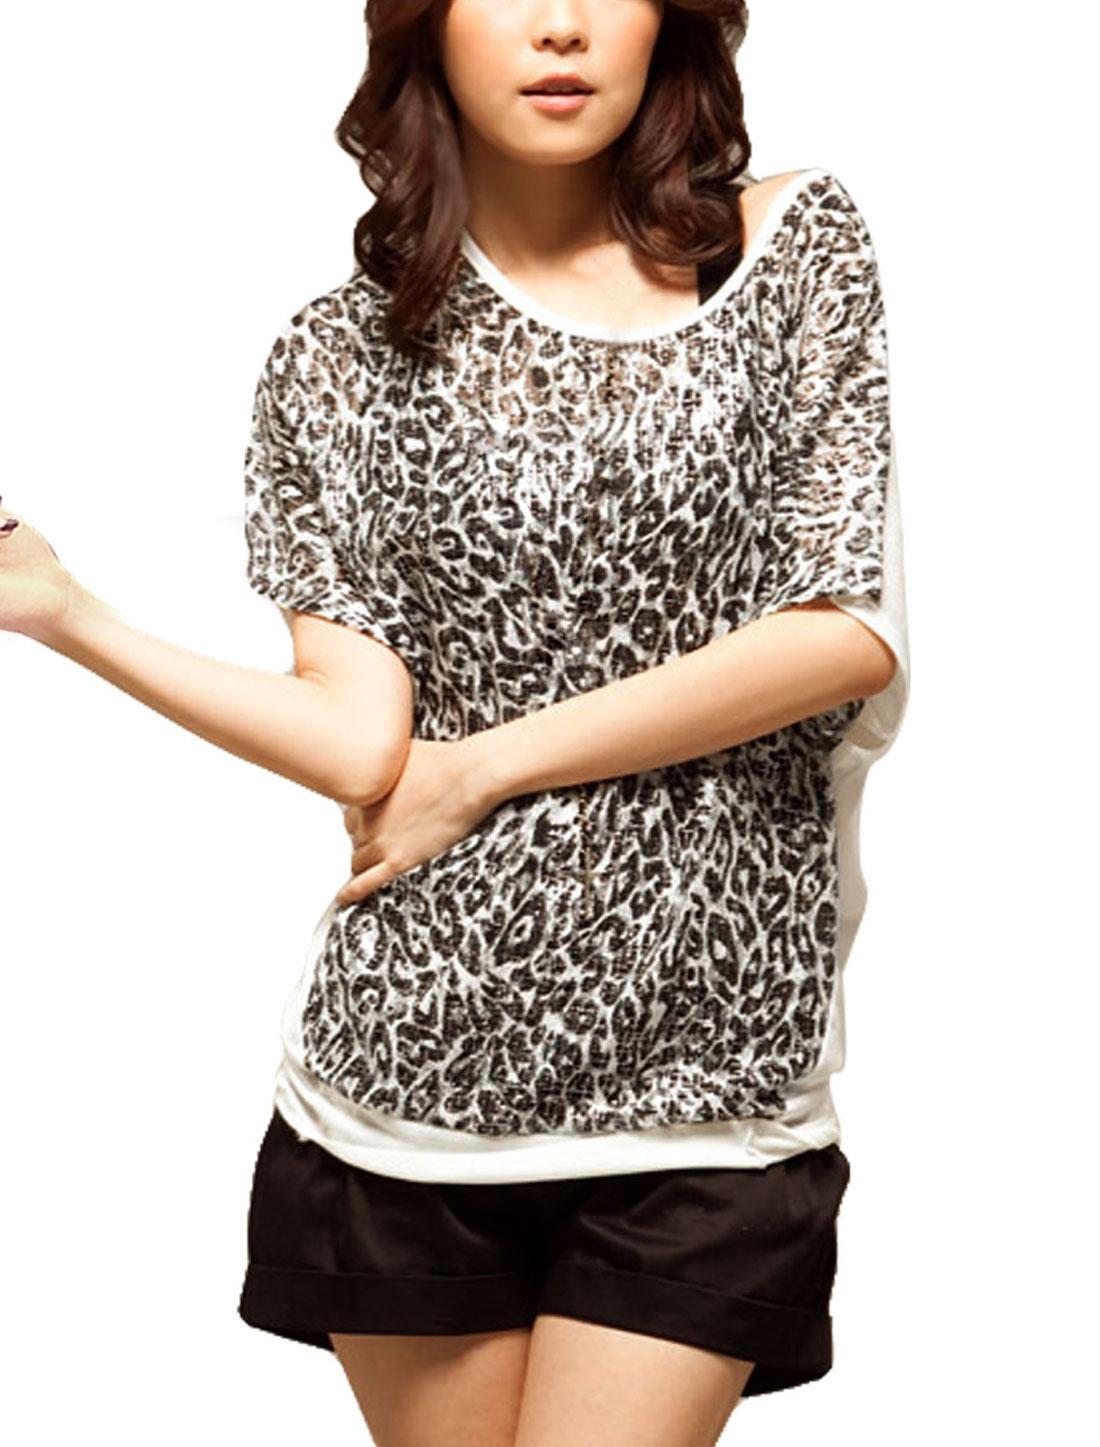 Women Scoop Neck Bat Sleeve Leopard Print Front White Back Shirt S